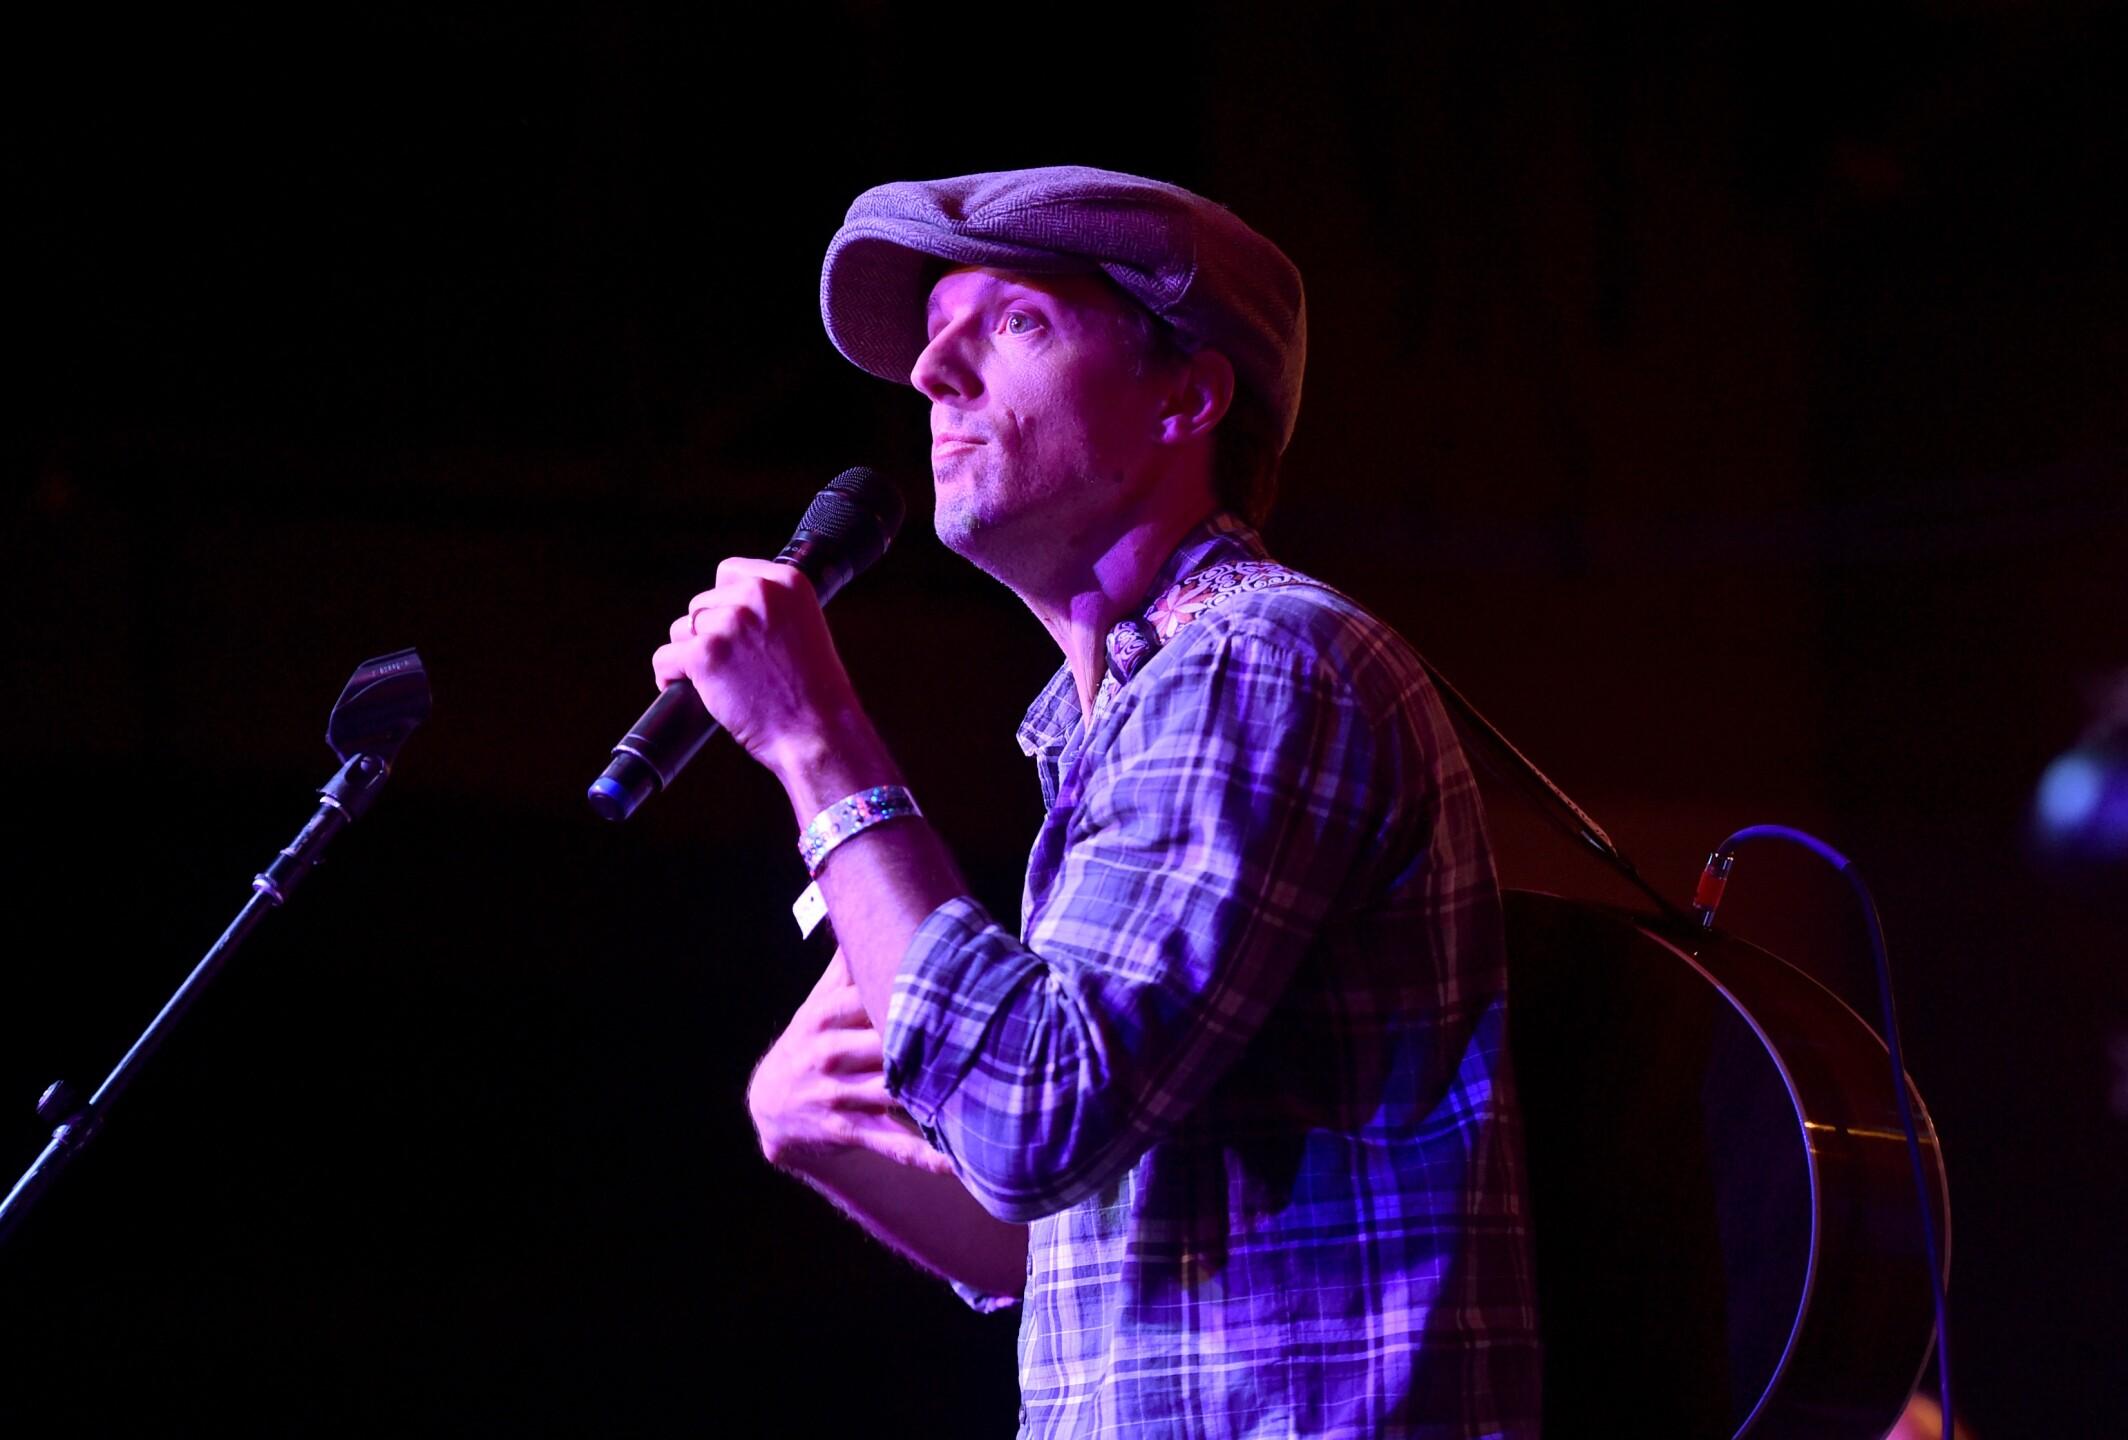 Jason Mraz will perform July 7 at Summerfest